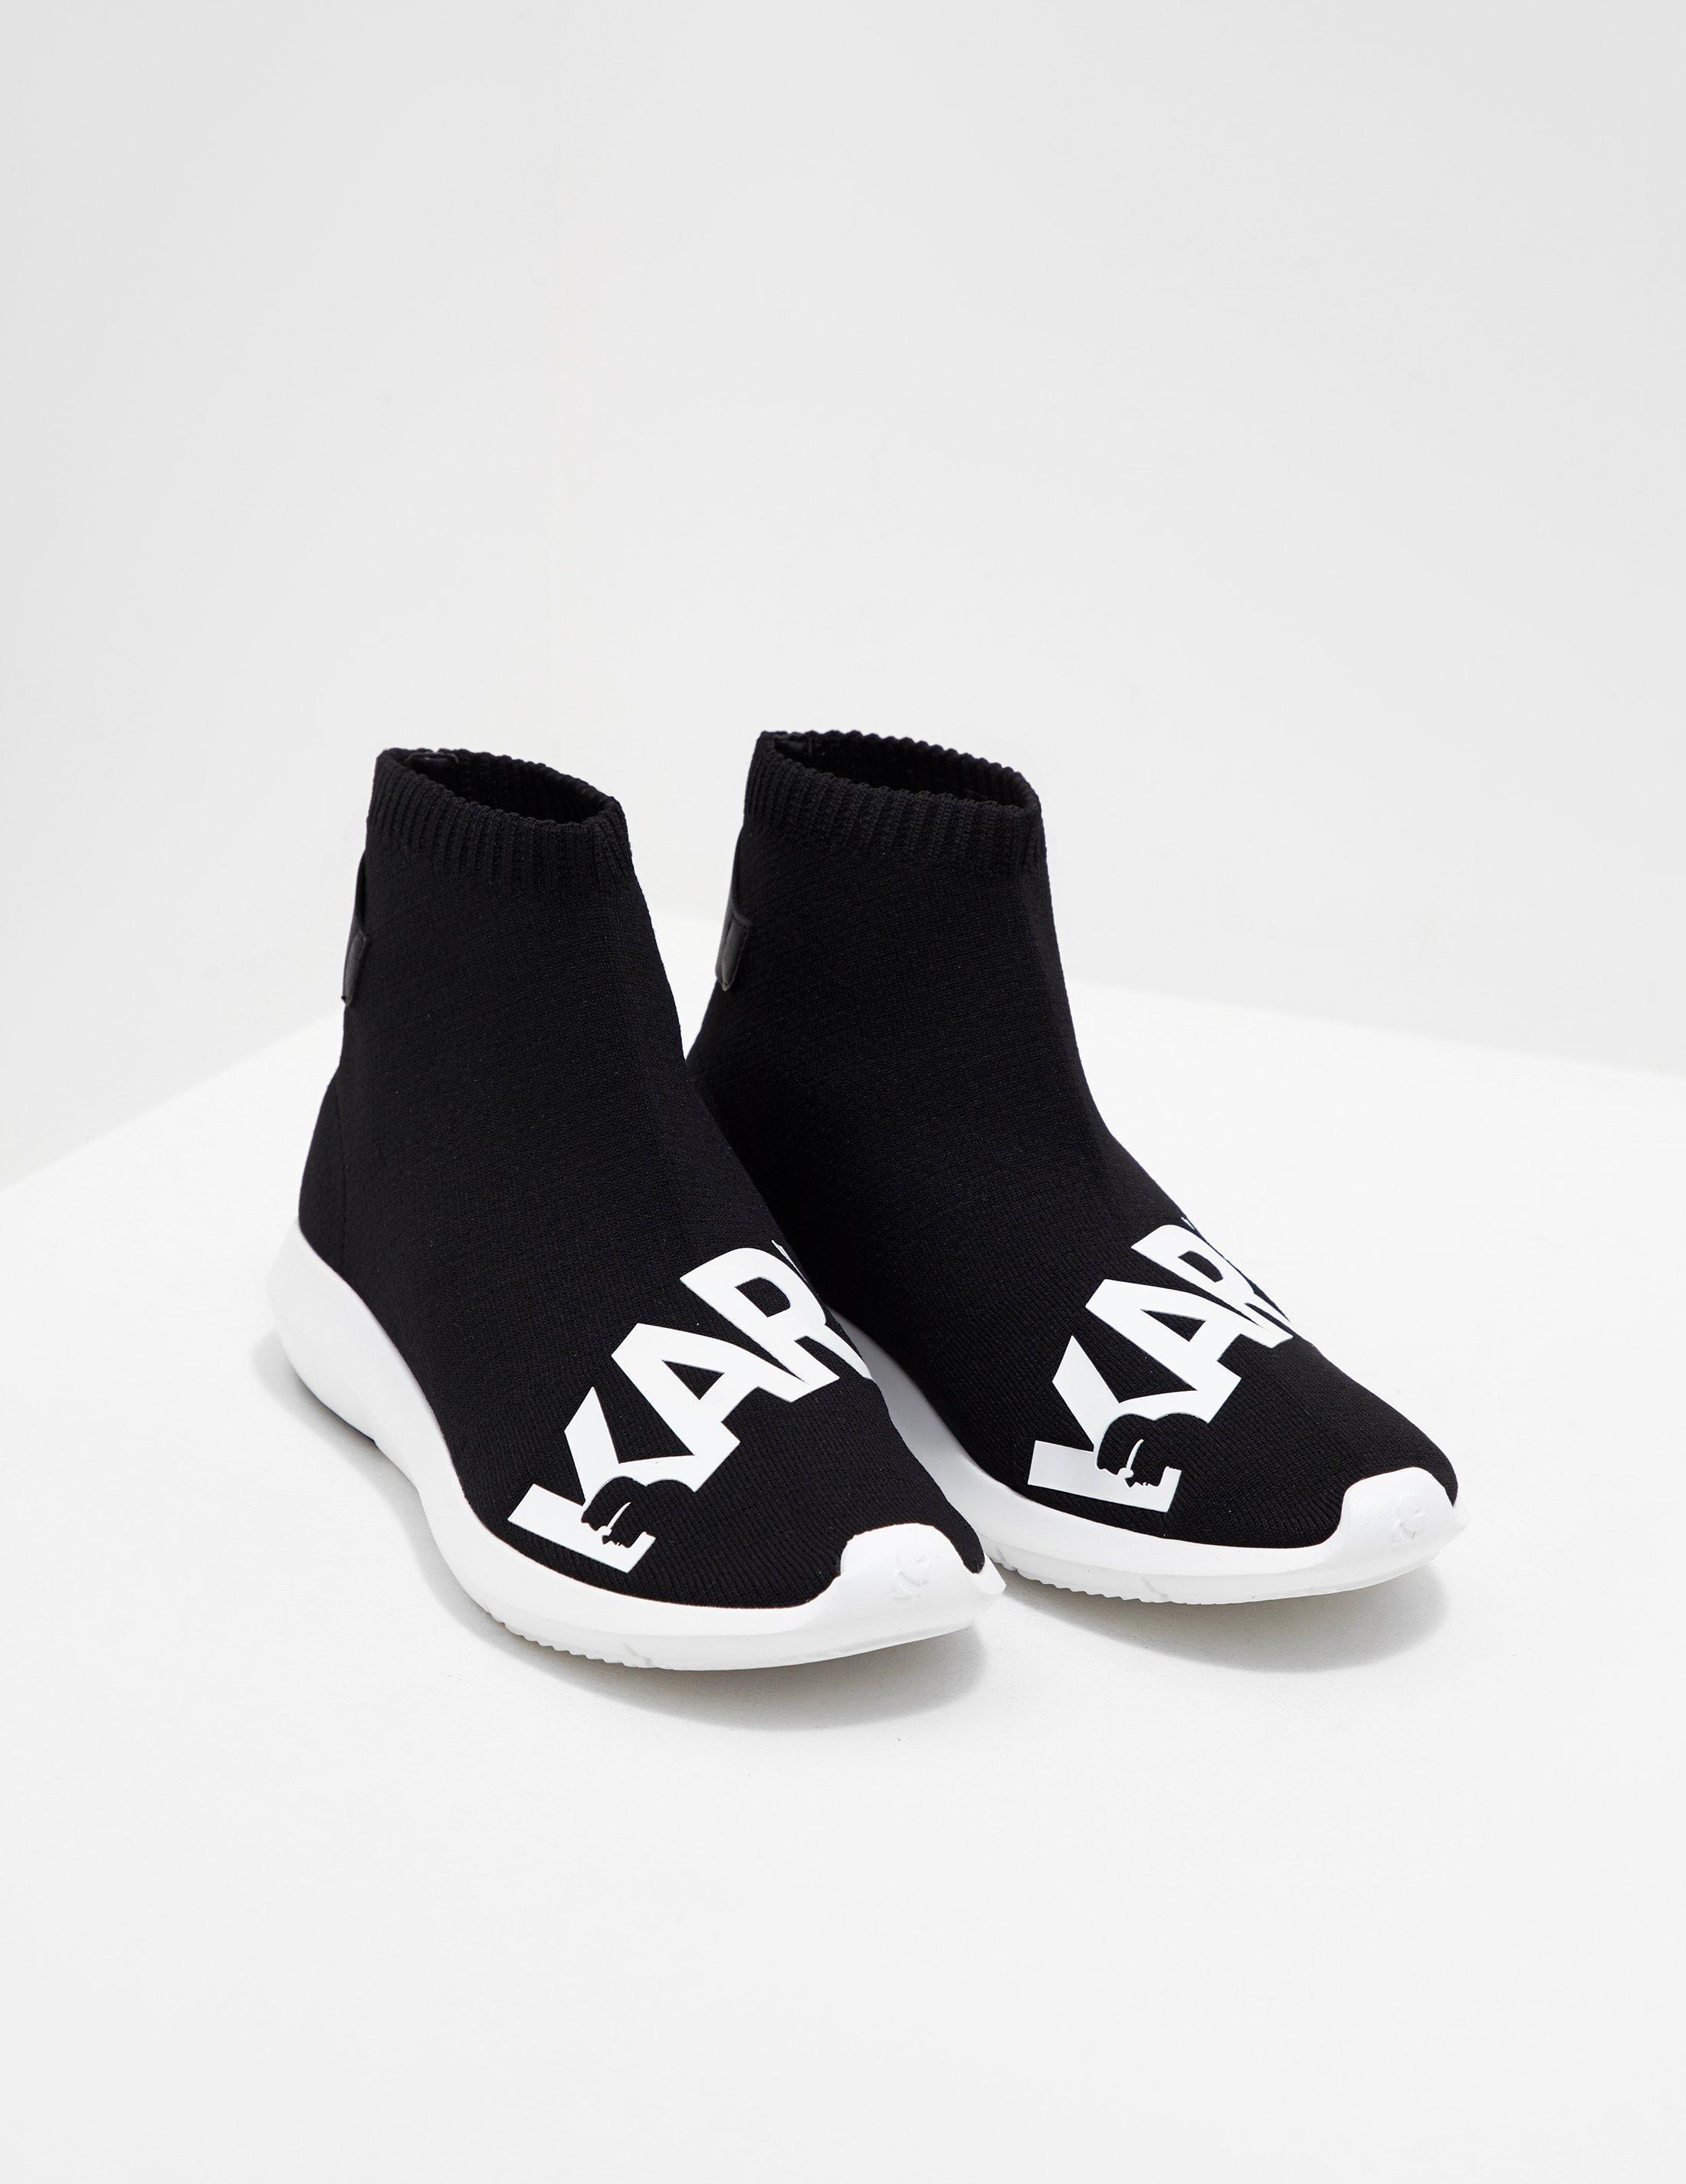 karl-lagerfeld-Black-Womens-Sock- shoes